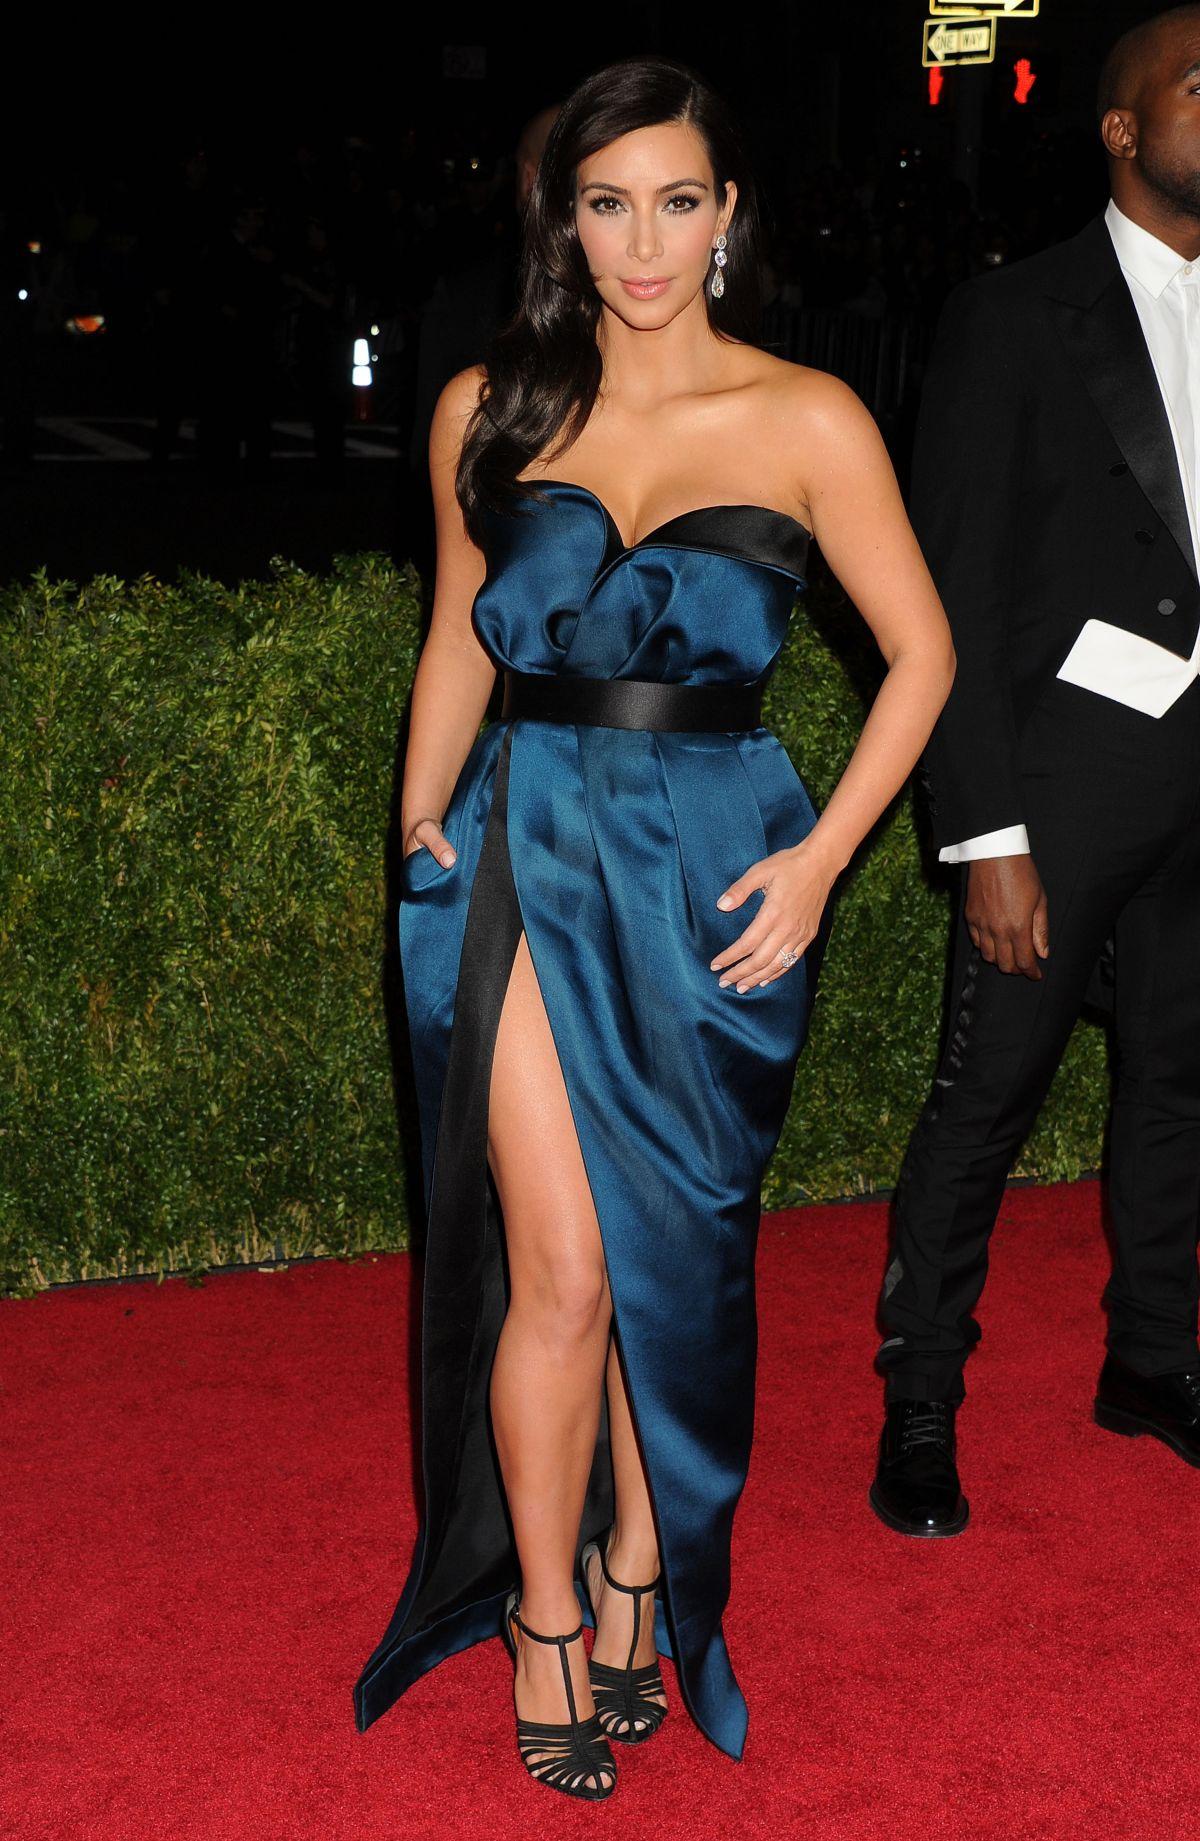 Kim Kardashians Memorable Red Carpet Looks From 2014